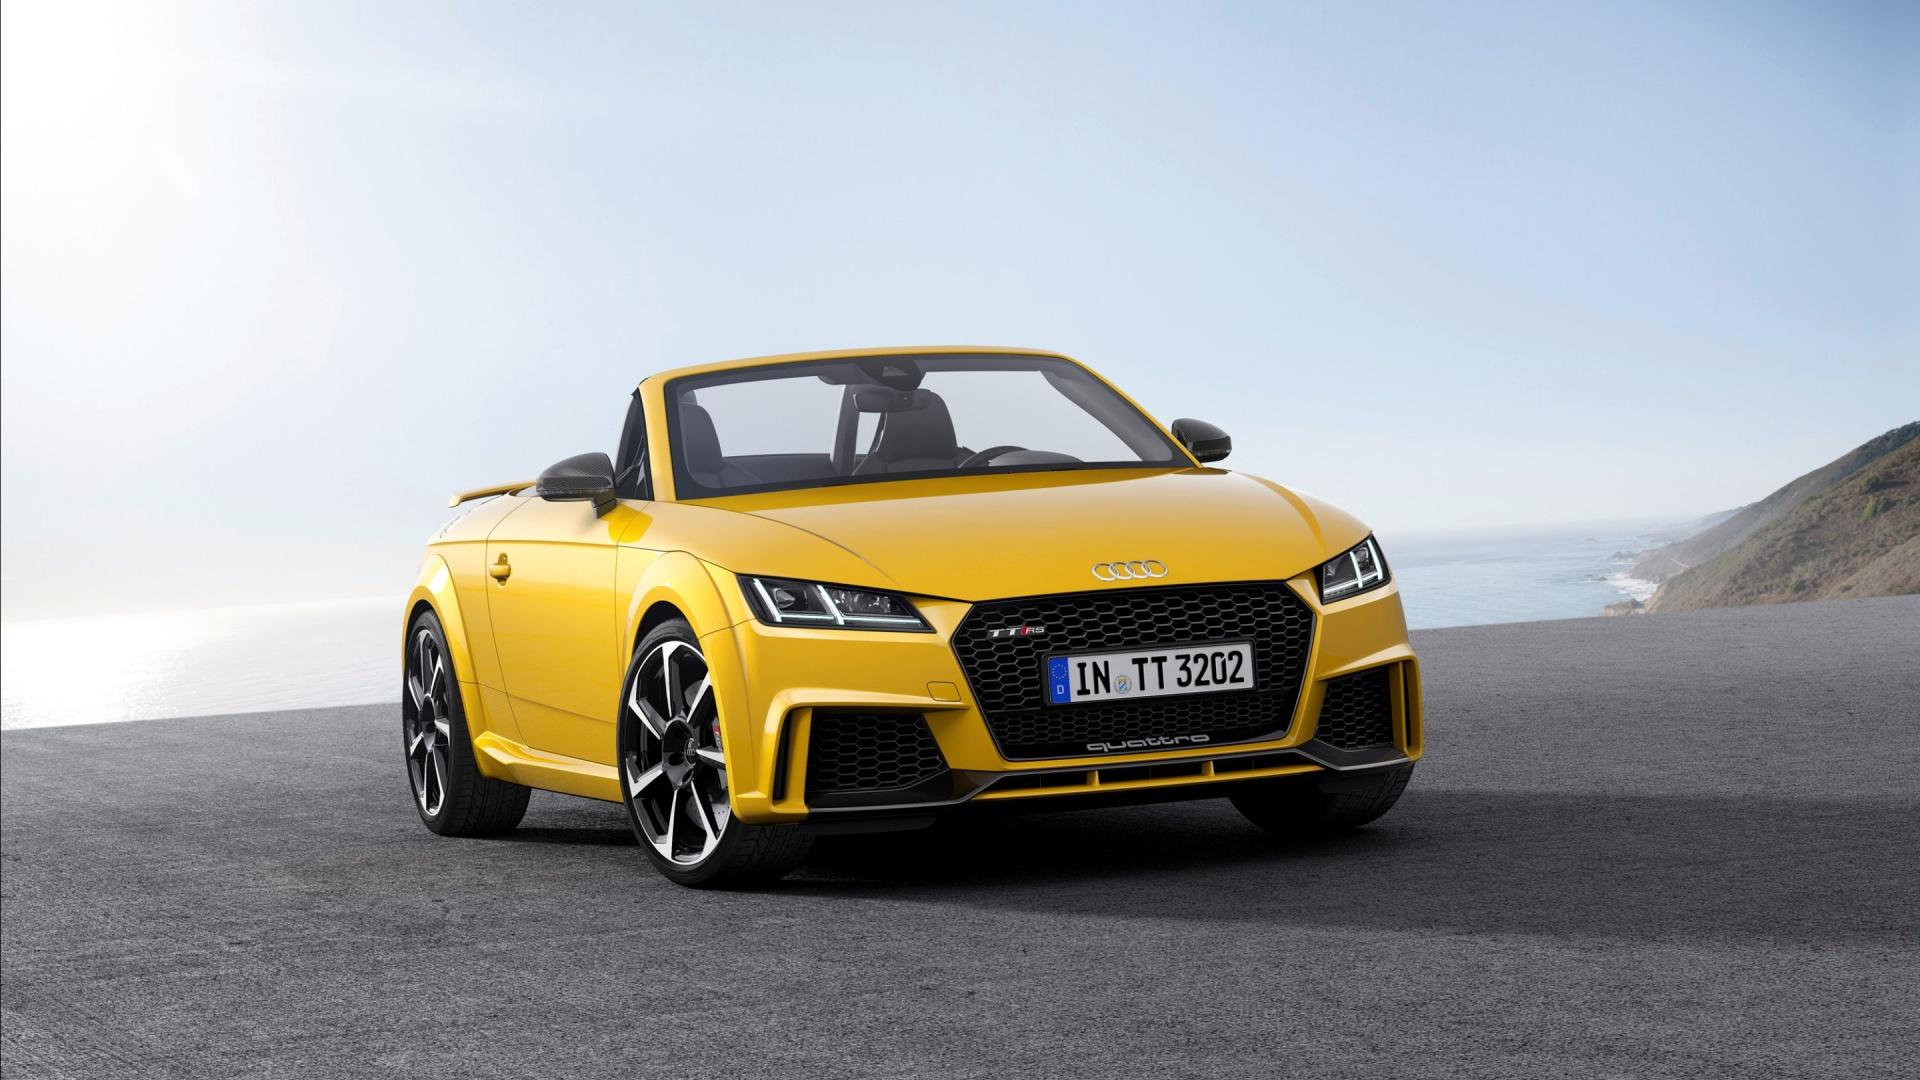 Audi Tt Rs Roadster 2016 Wallpapers 1920x1080 525448